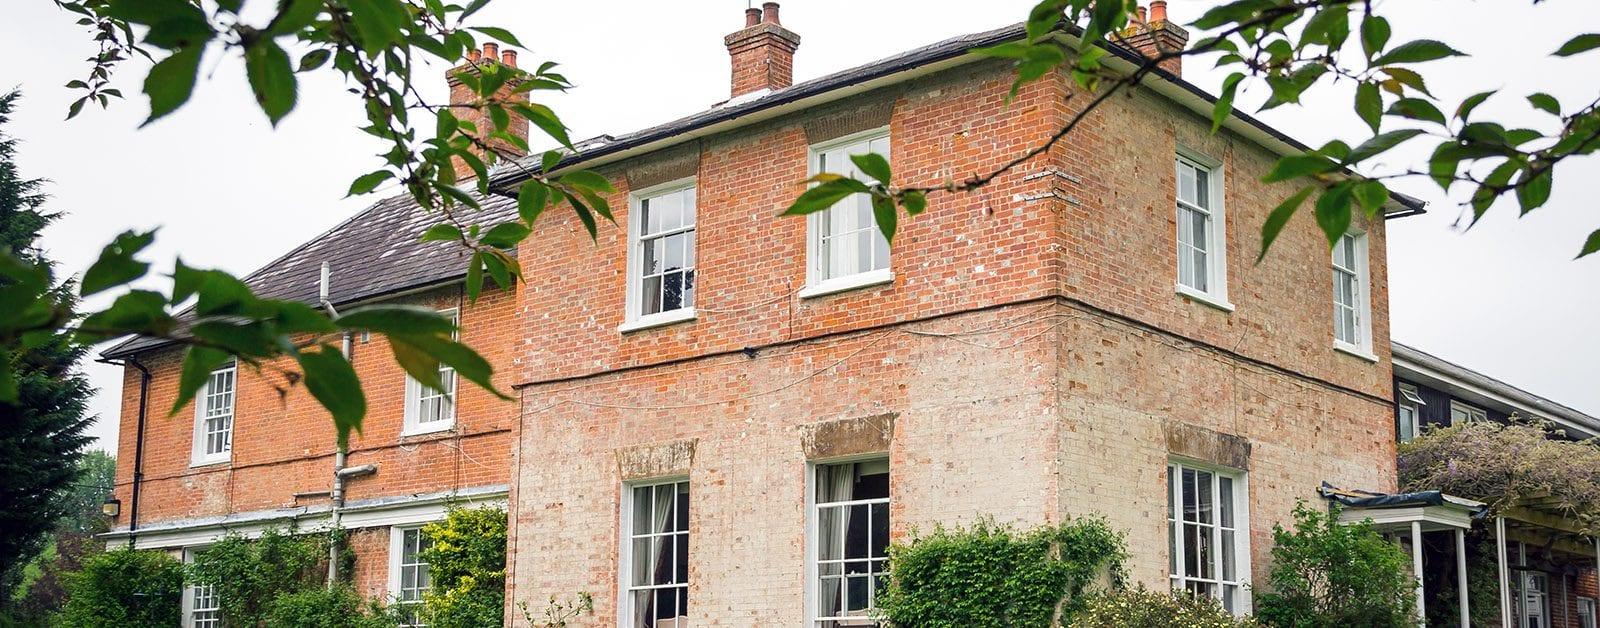 the lawn care home hampshire